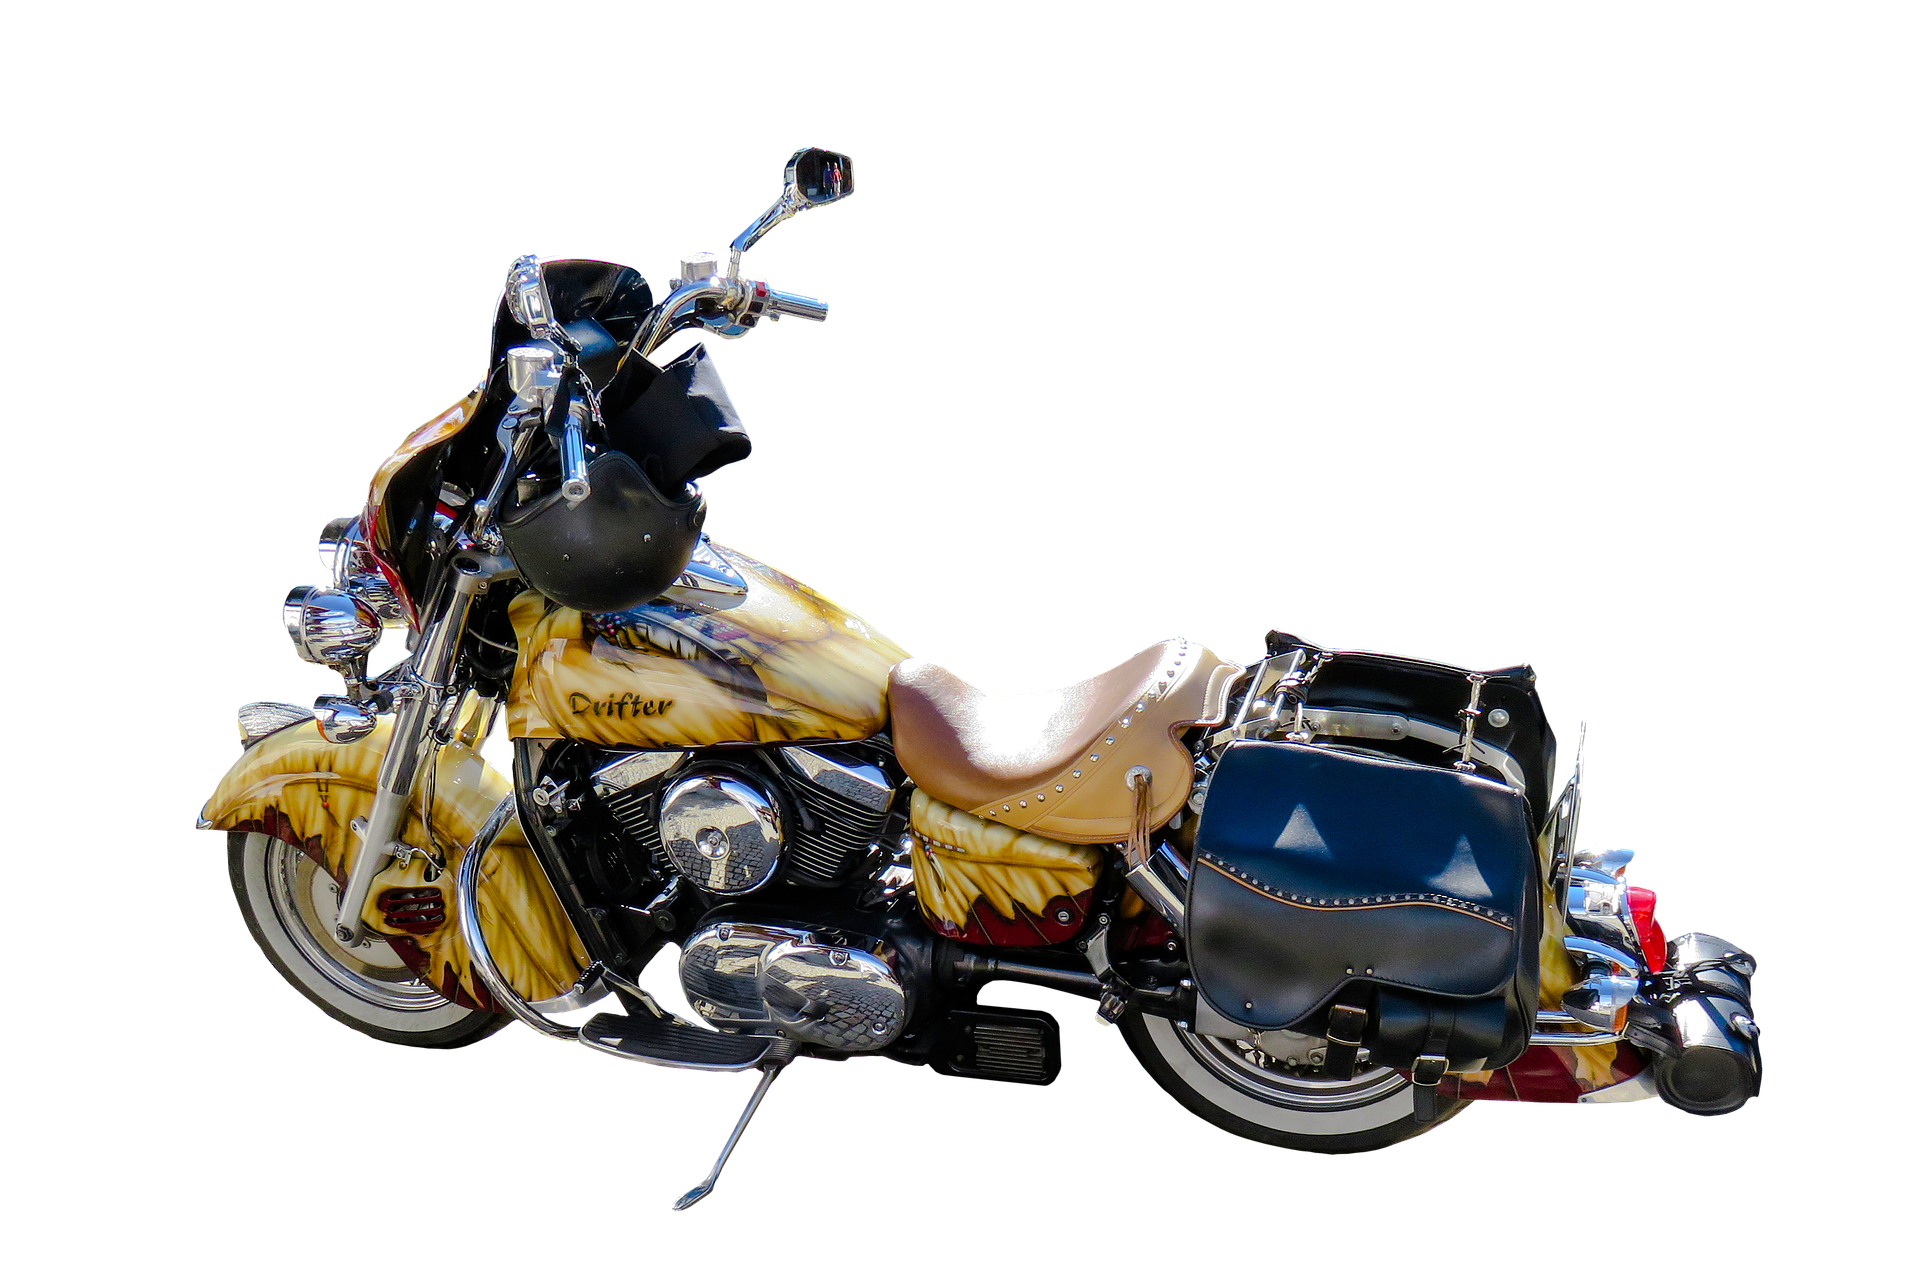 Drifter  Bike, Bike, Custom, Drifter, Motor, HQ Photo